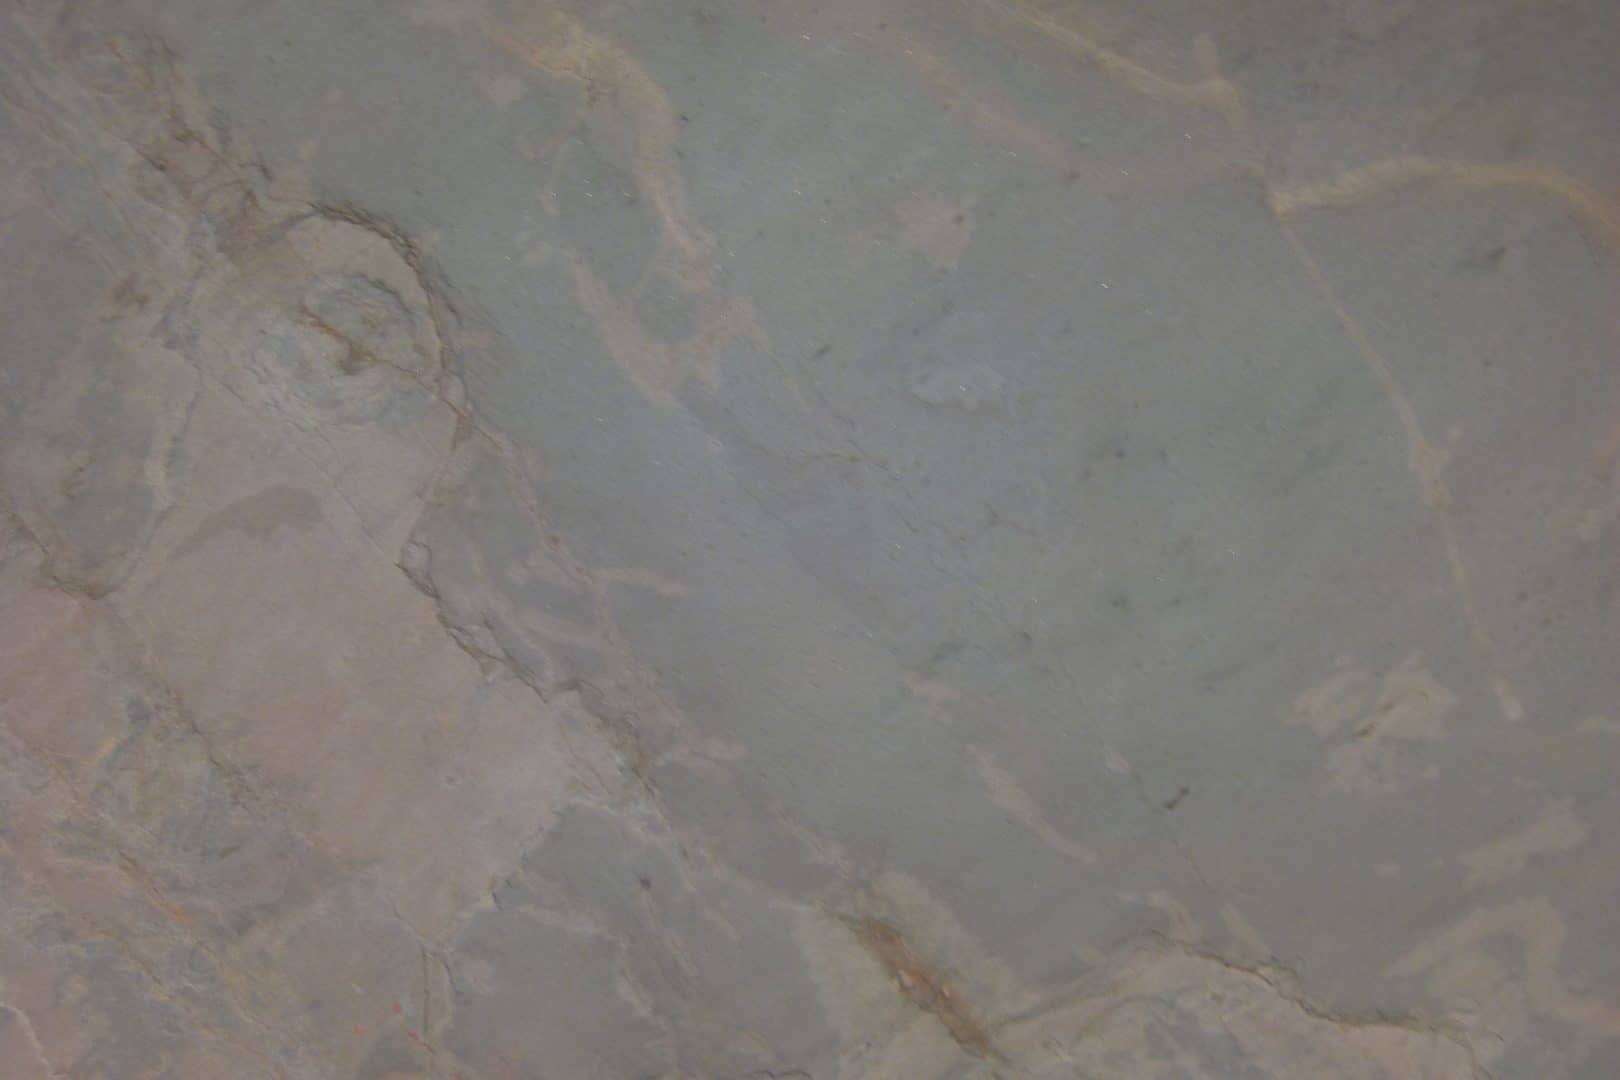 Naturamat Designflex translucide Rustique Off Feuille de pierre naturelle flexible